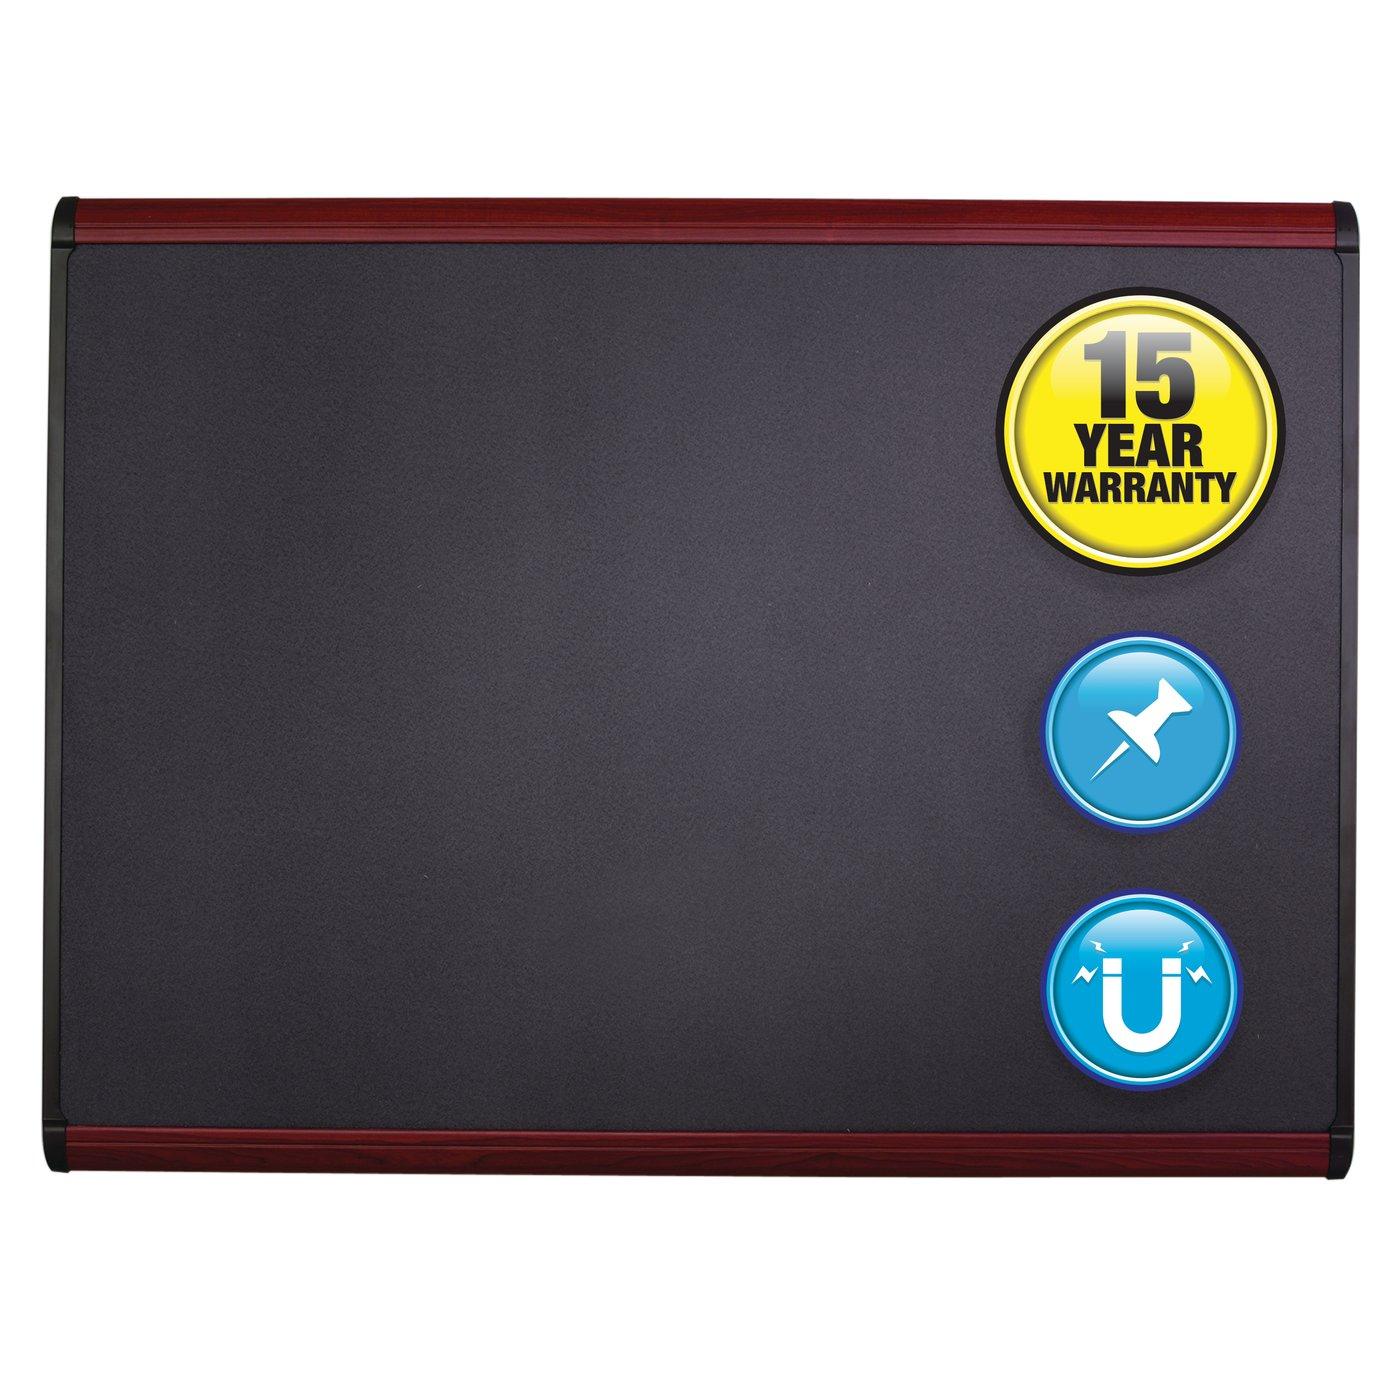 Quartet - Boards - Bulletin Boards - Magnetic Fabric Bulletin Boards ...